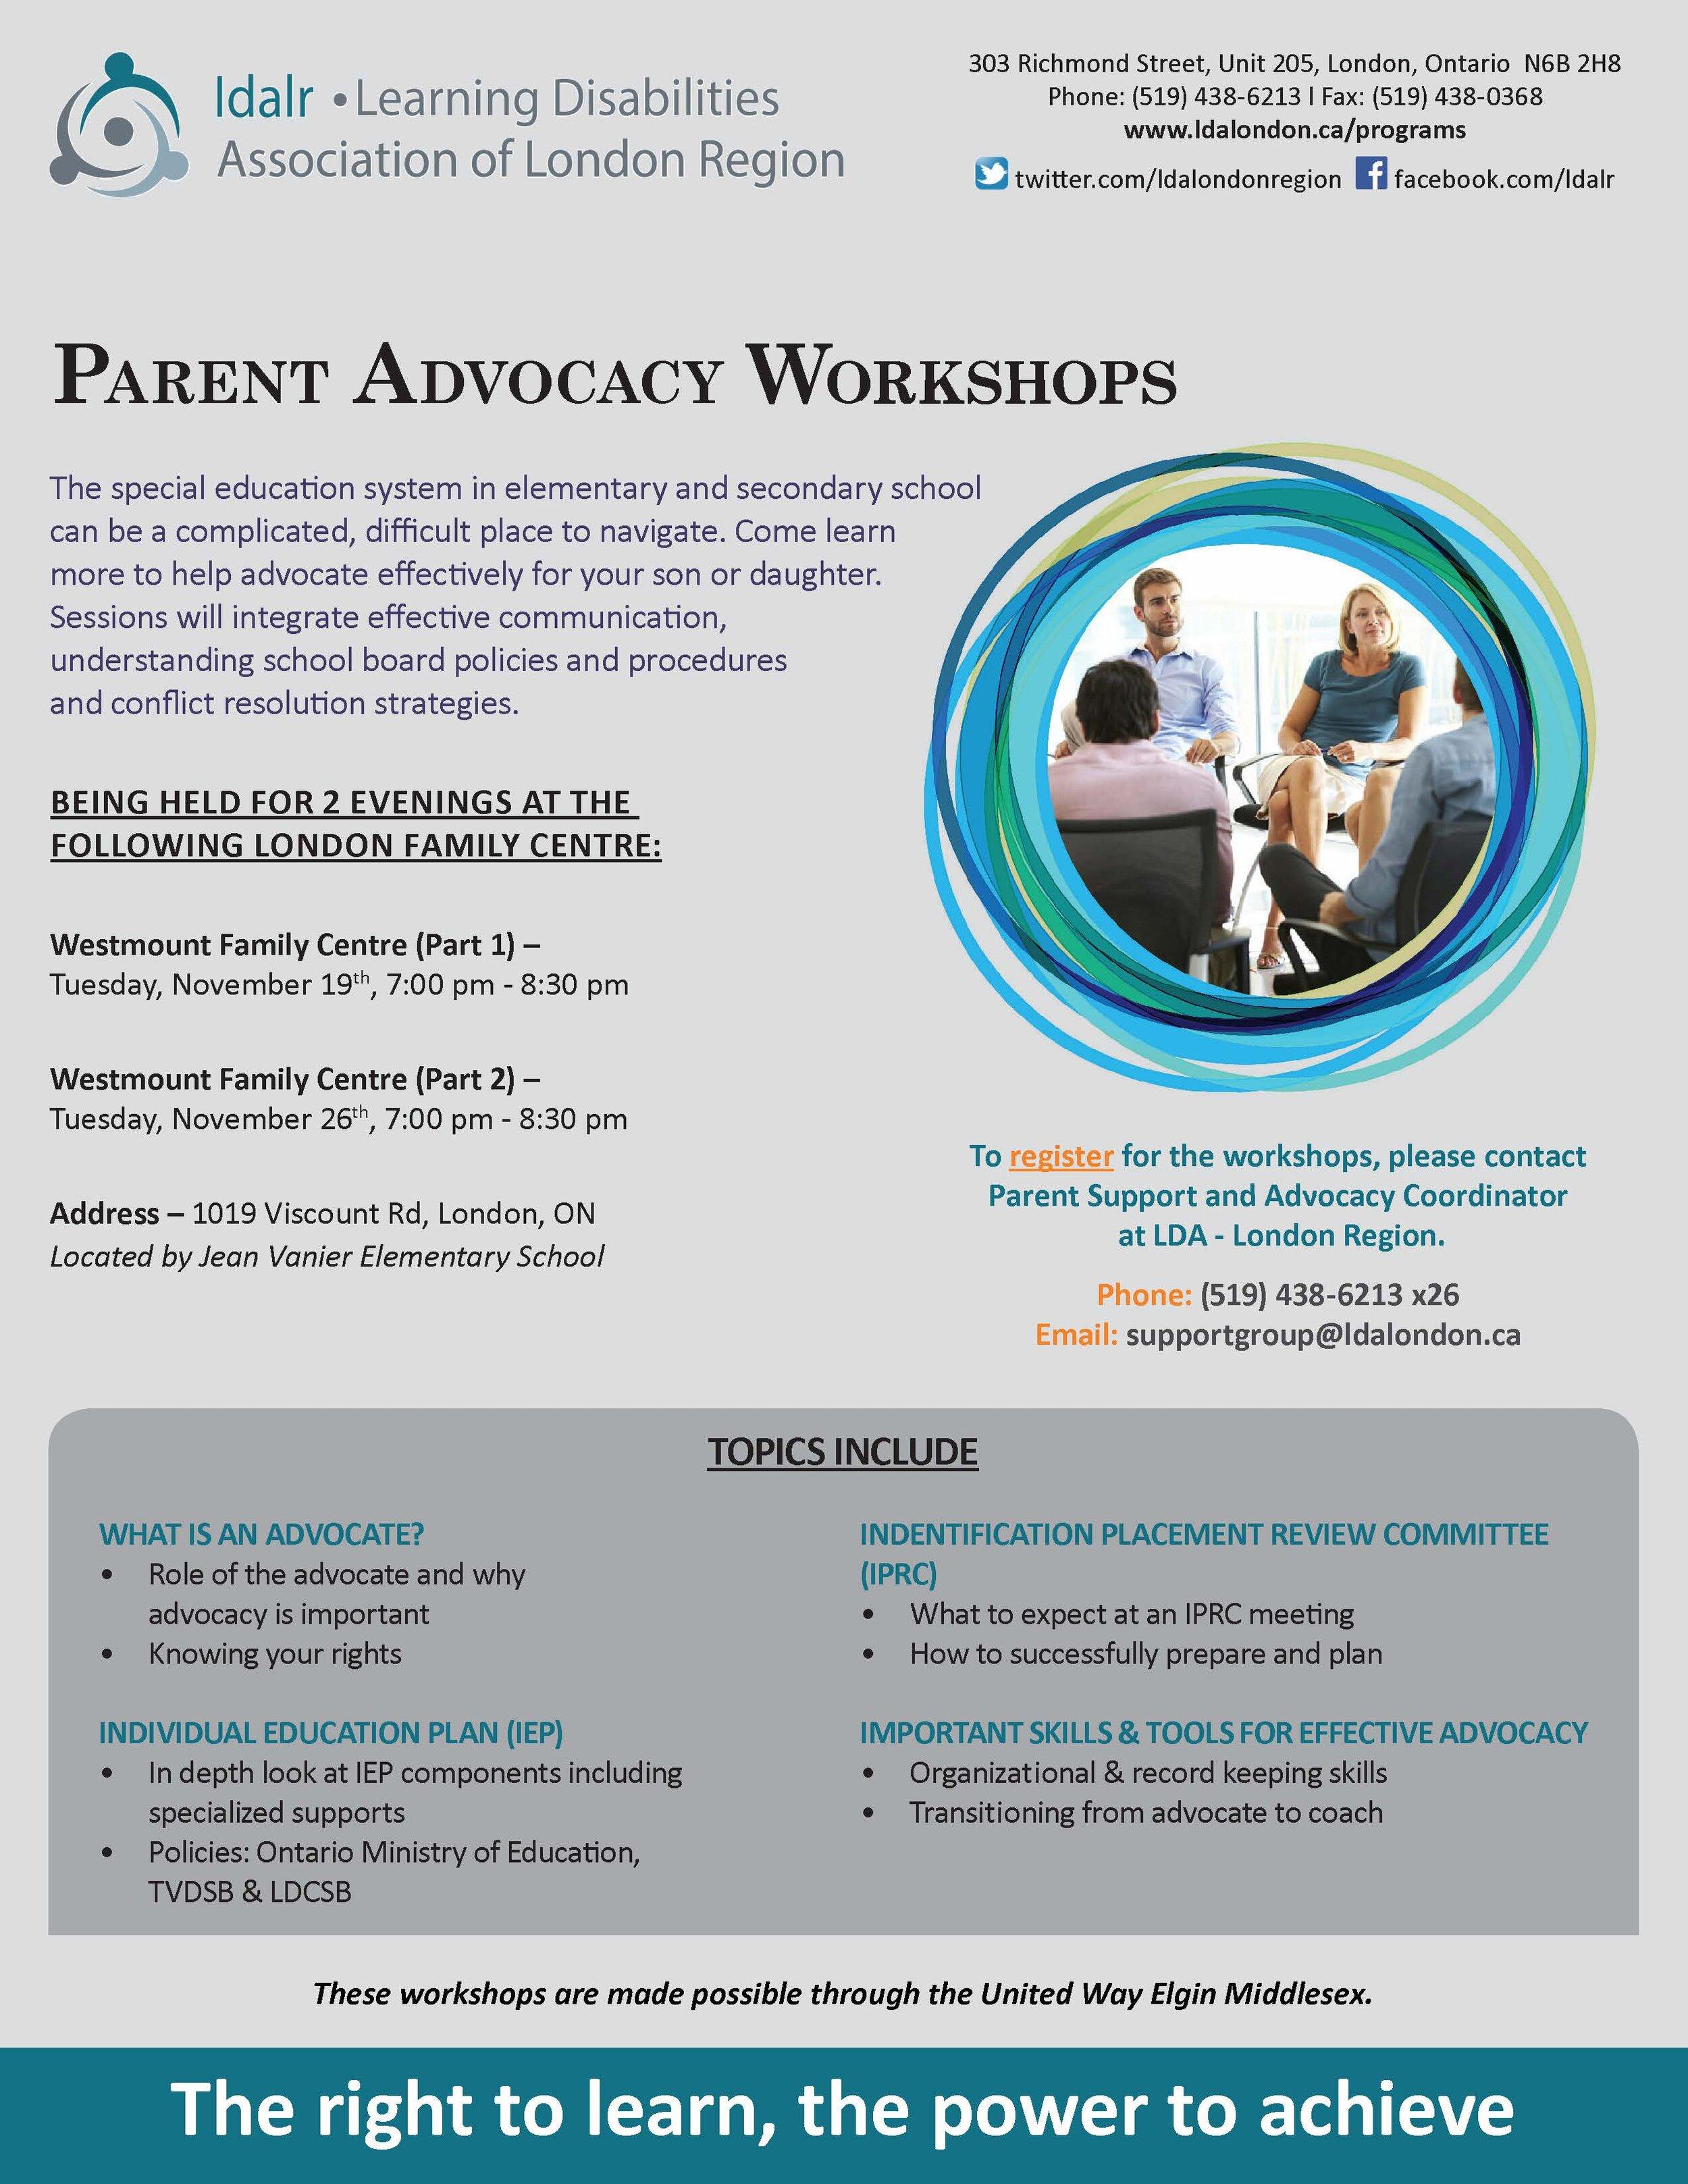 ParentAdvocacy Poster_2019.jpg